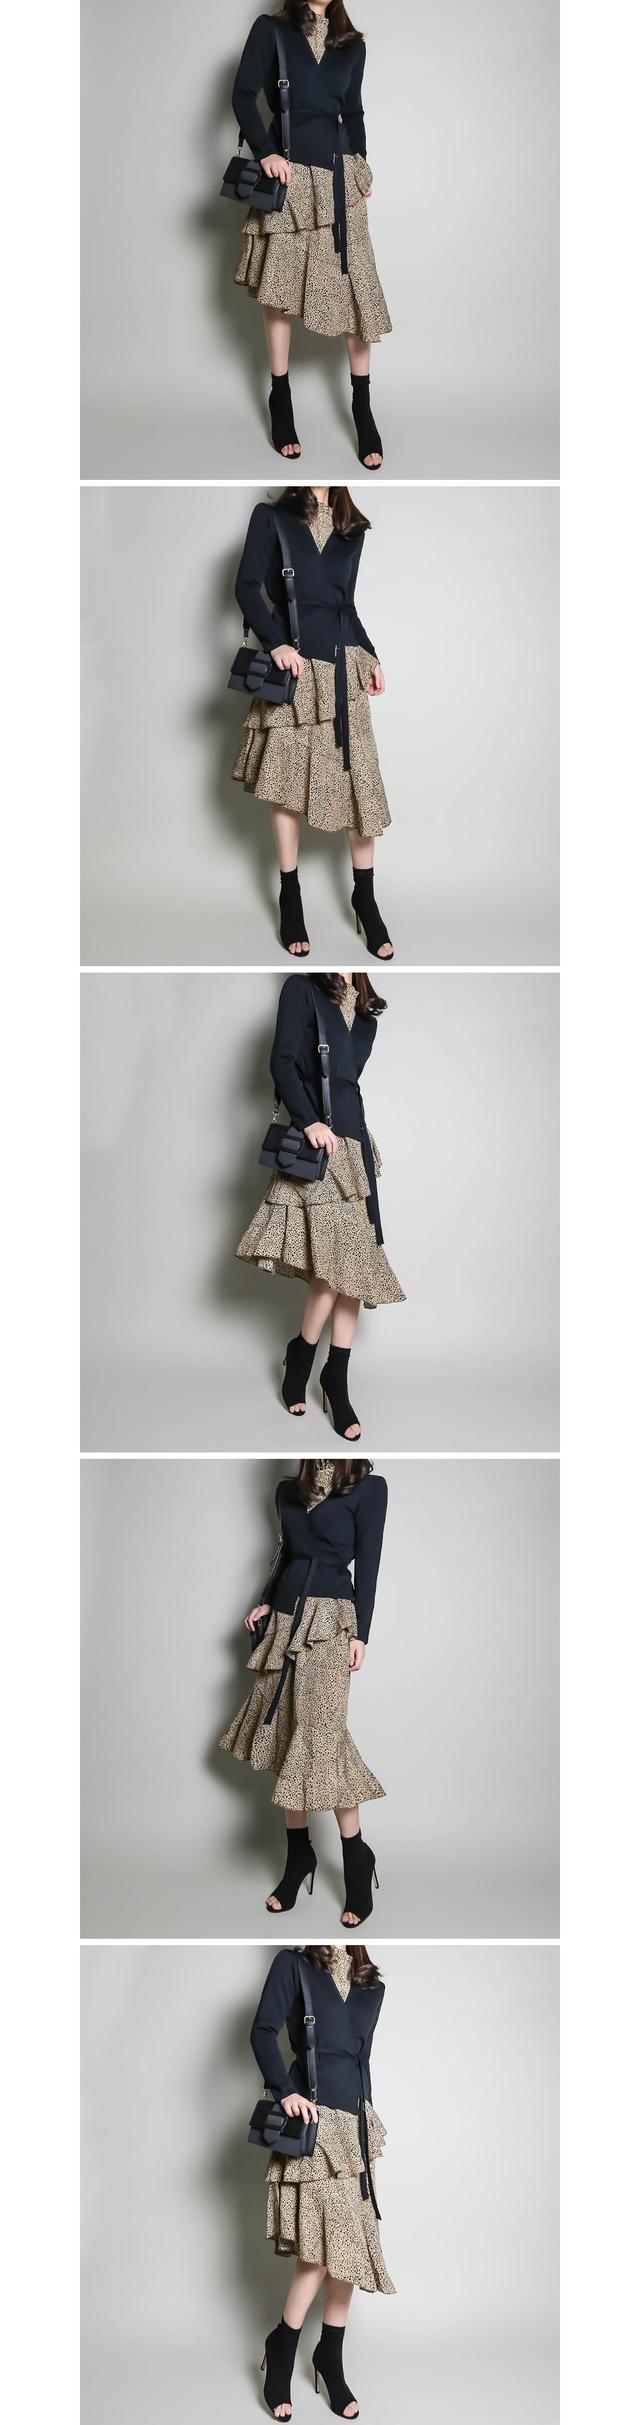 Dot print unblocked cane dress _op02971